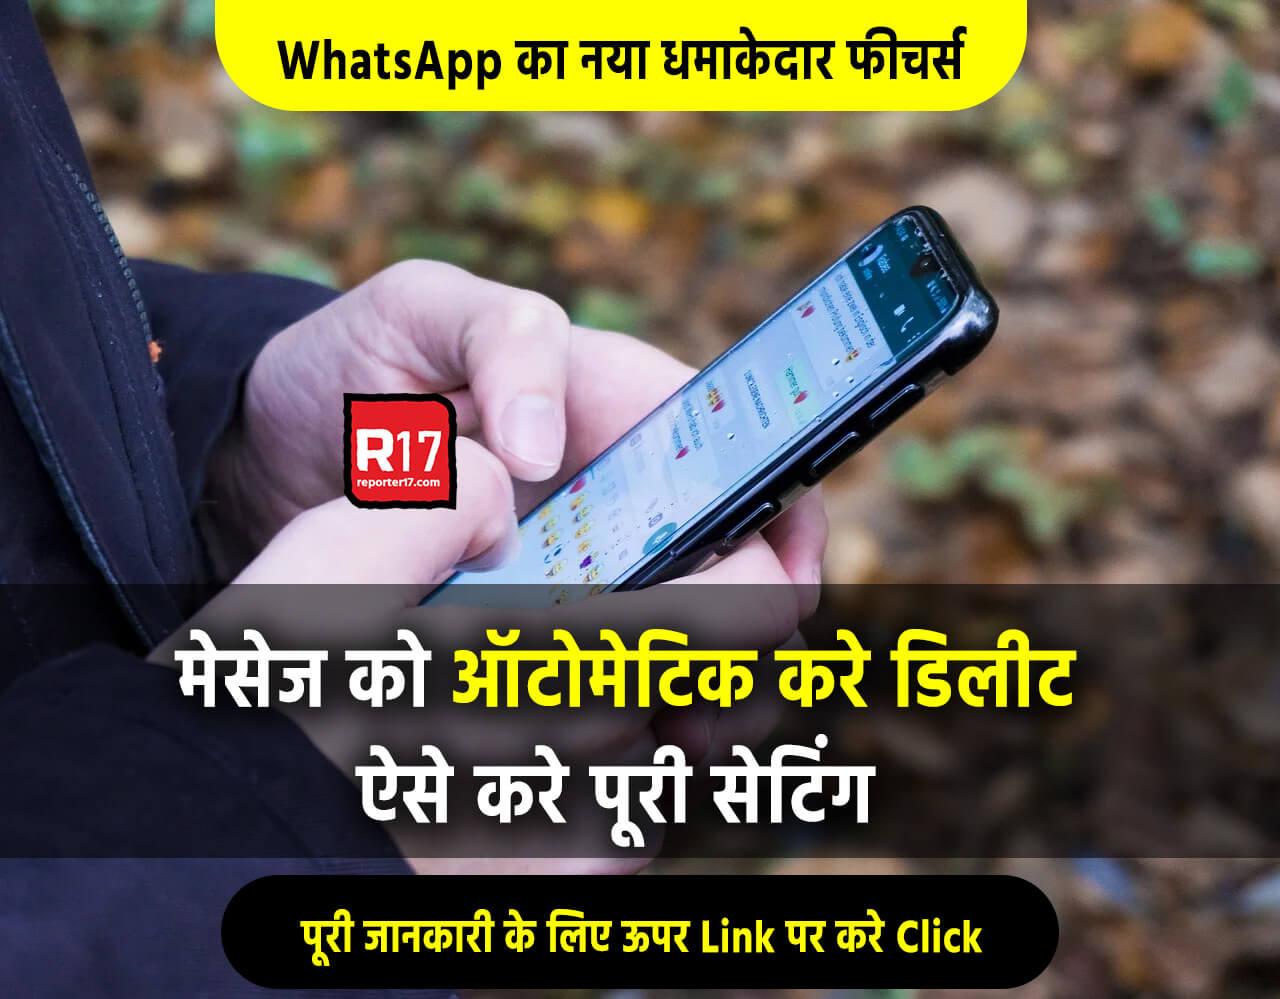 WhatsApp Expiring Media Feature 2020